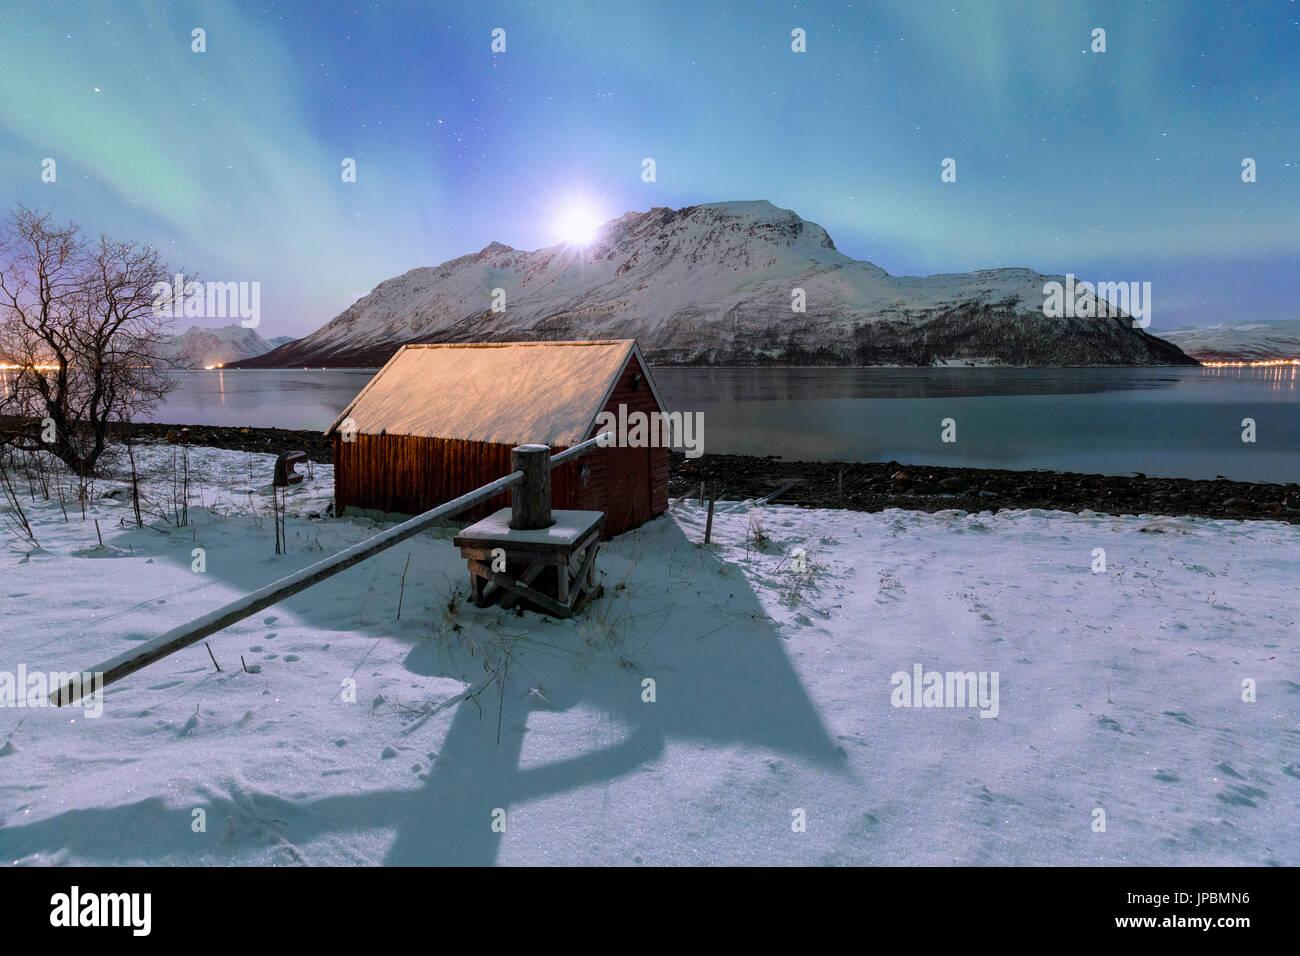 Northern lights over the fjord illuminates by the moon. Ravelseidet, Rotsundet, Lyngenfjord, Lyngen Alps, Troms, Norway, Lapland, Europe. - Stock Image